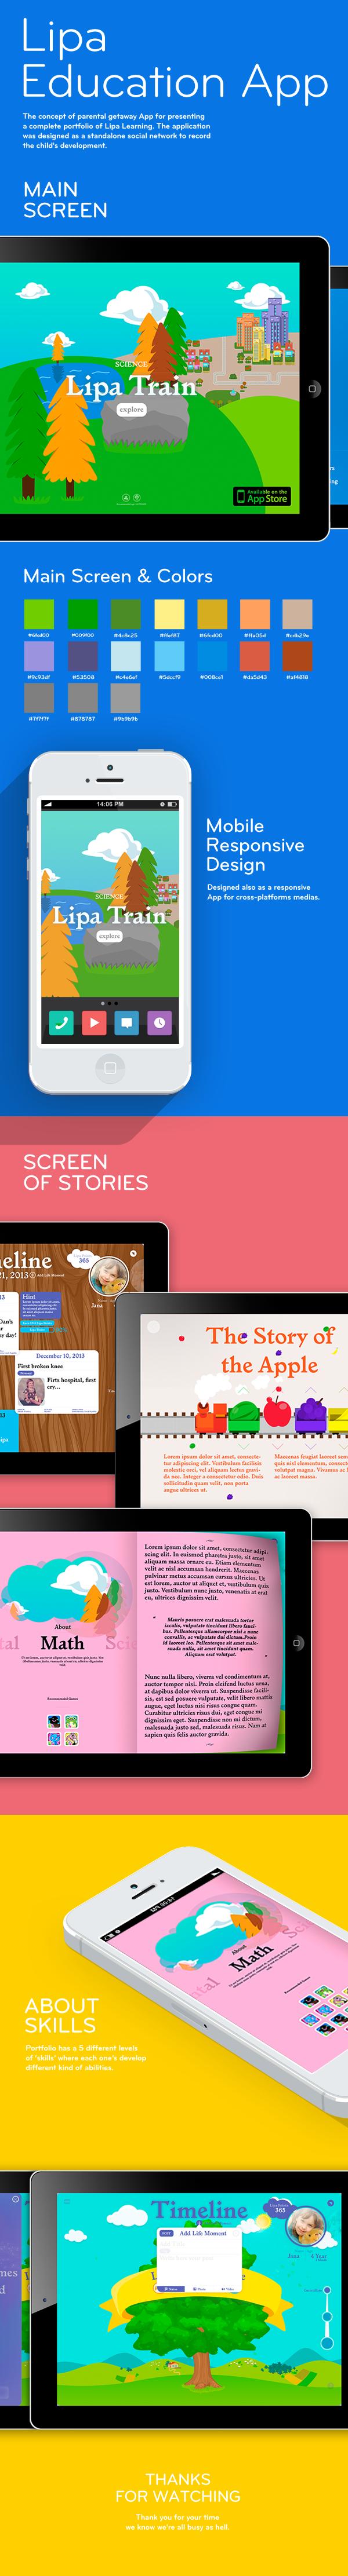 app design UX design Lipa Learning Education Responsive Design